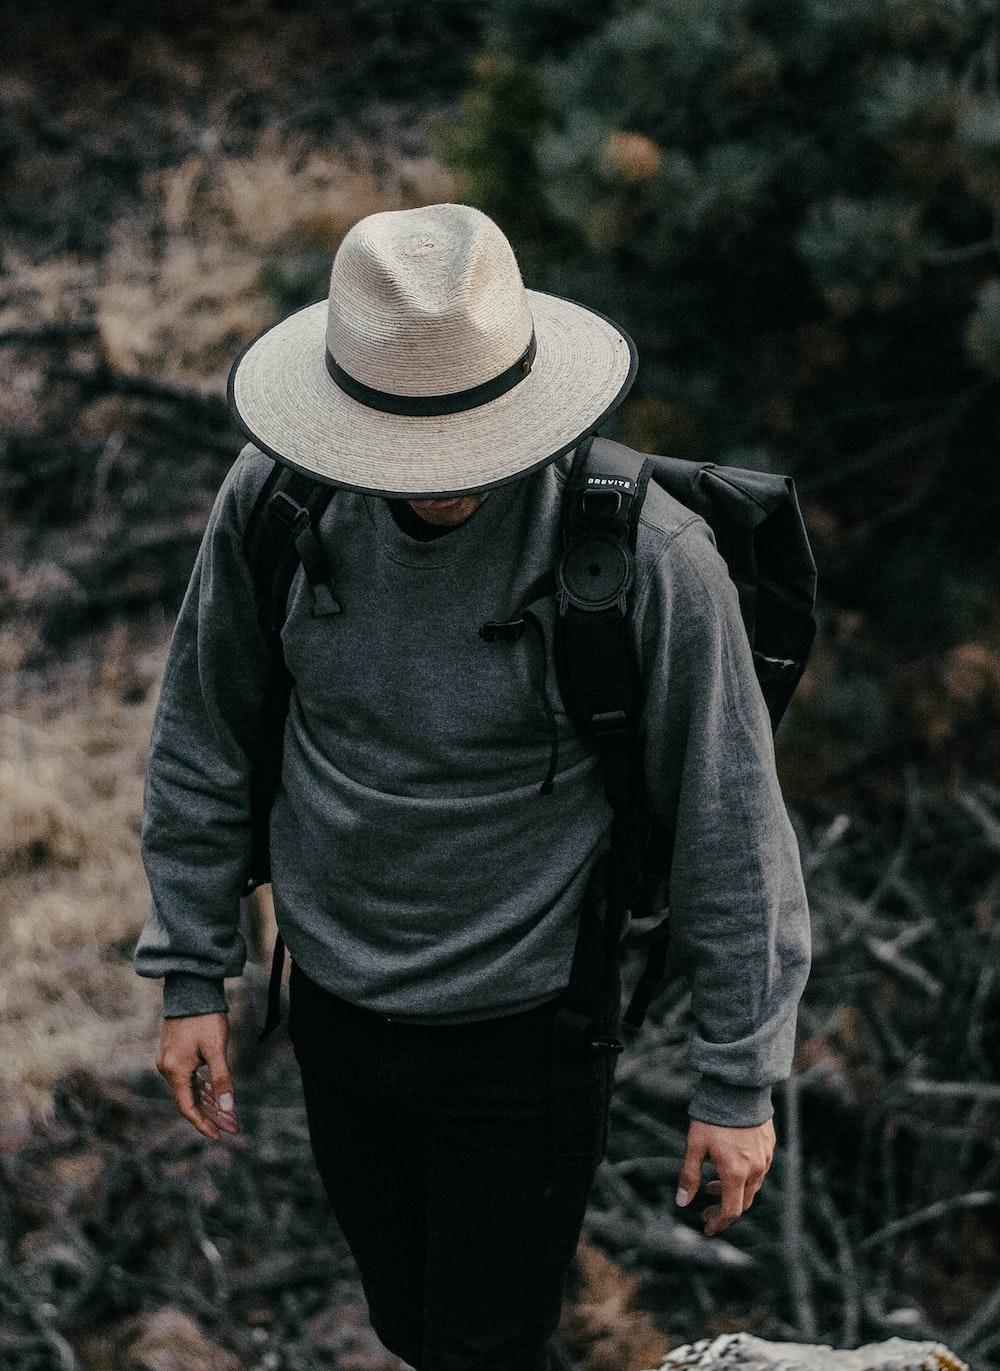 man walks and wears backpack, hat and sweatshirt